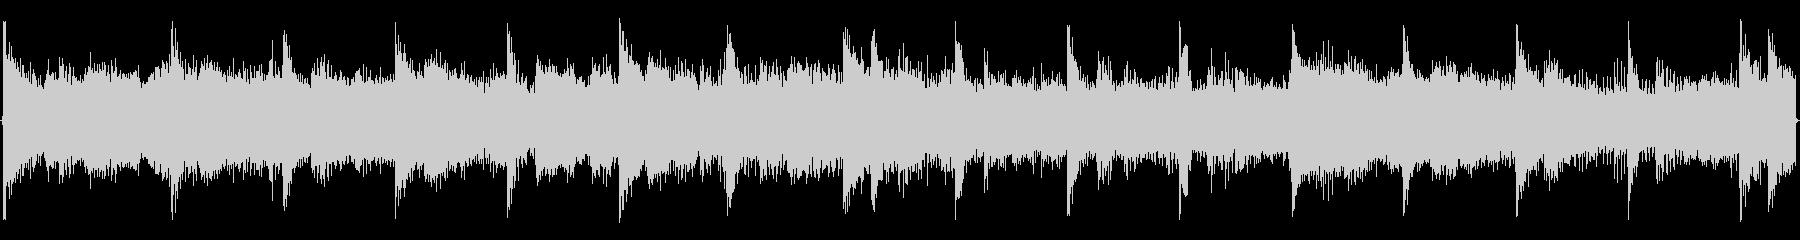 8bitチューンのRPG風エンディング1の未再生の波形